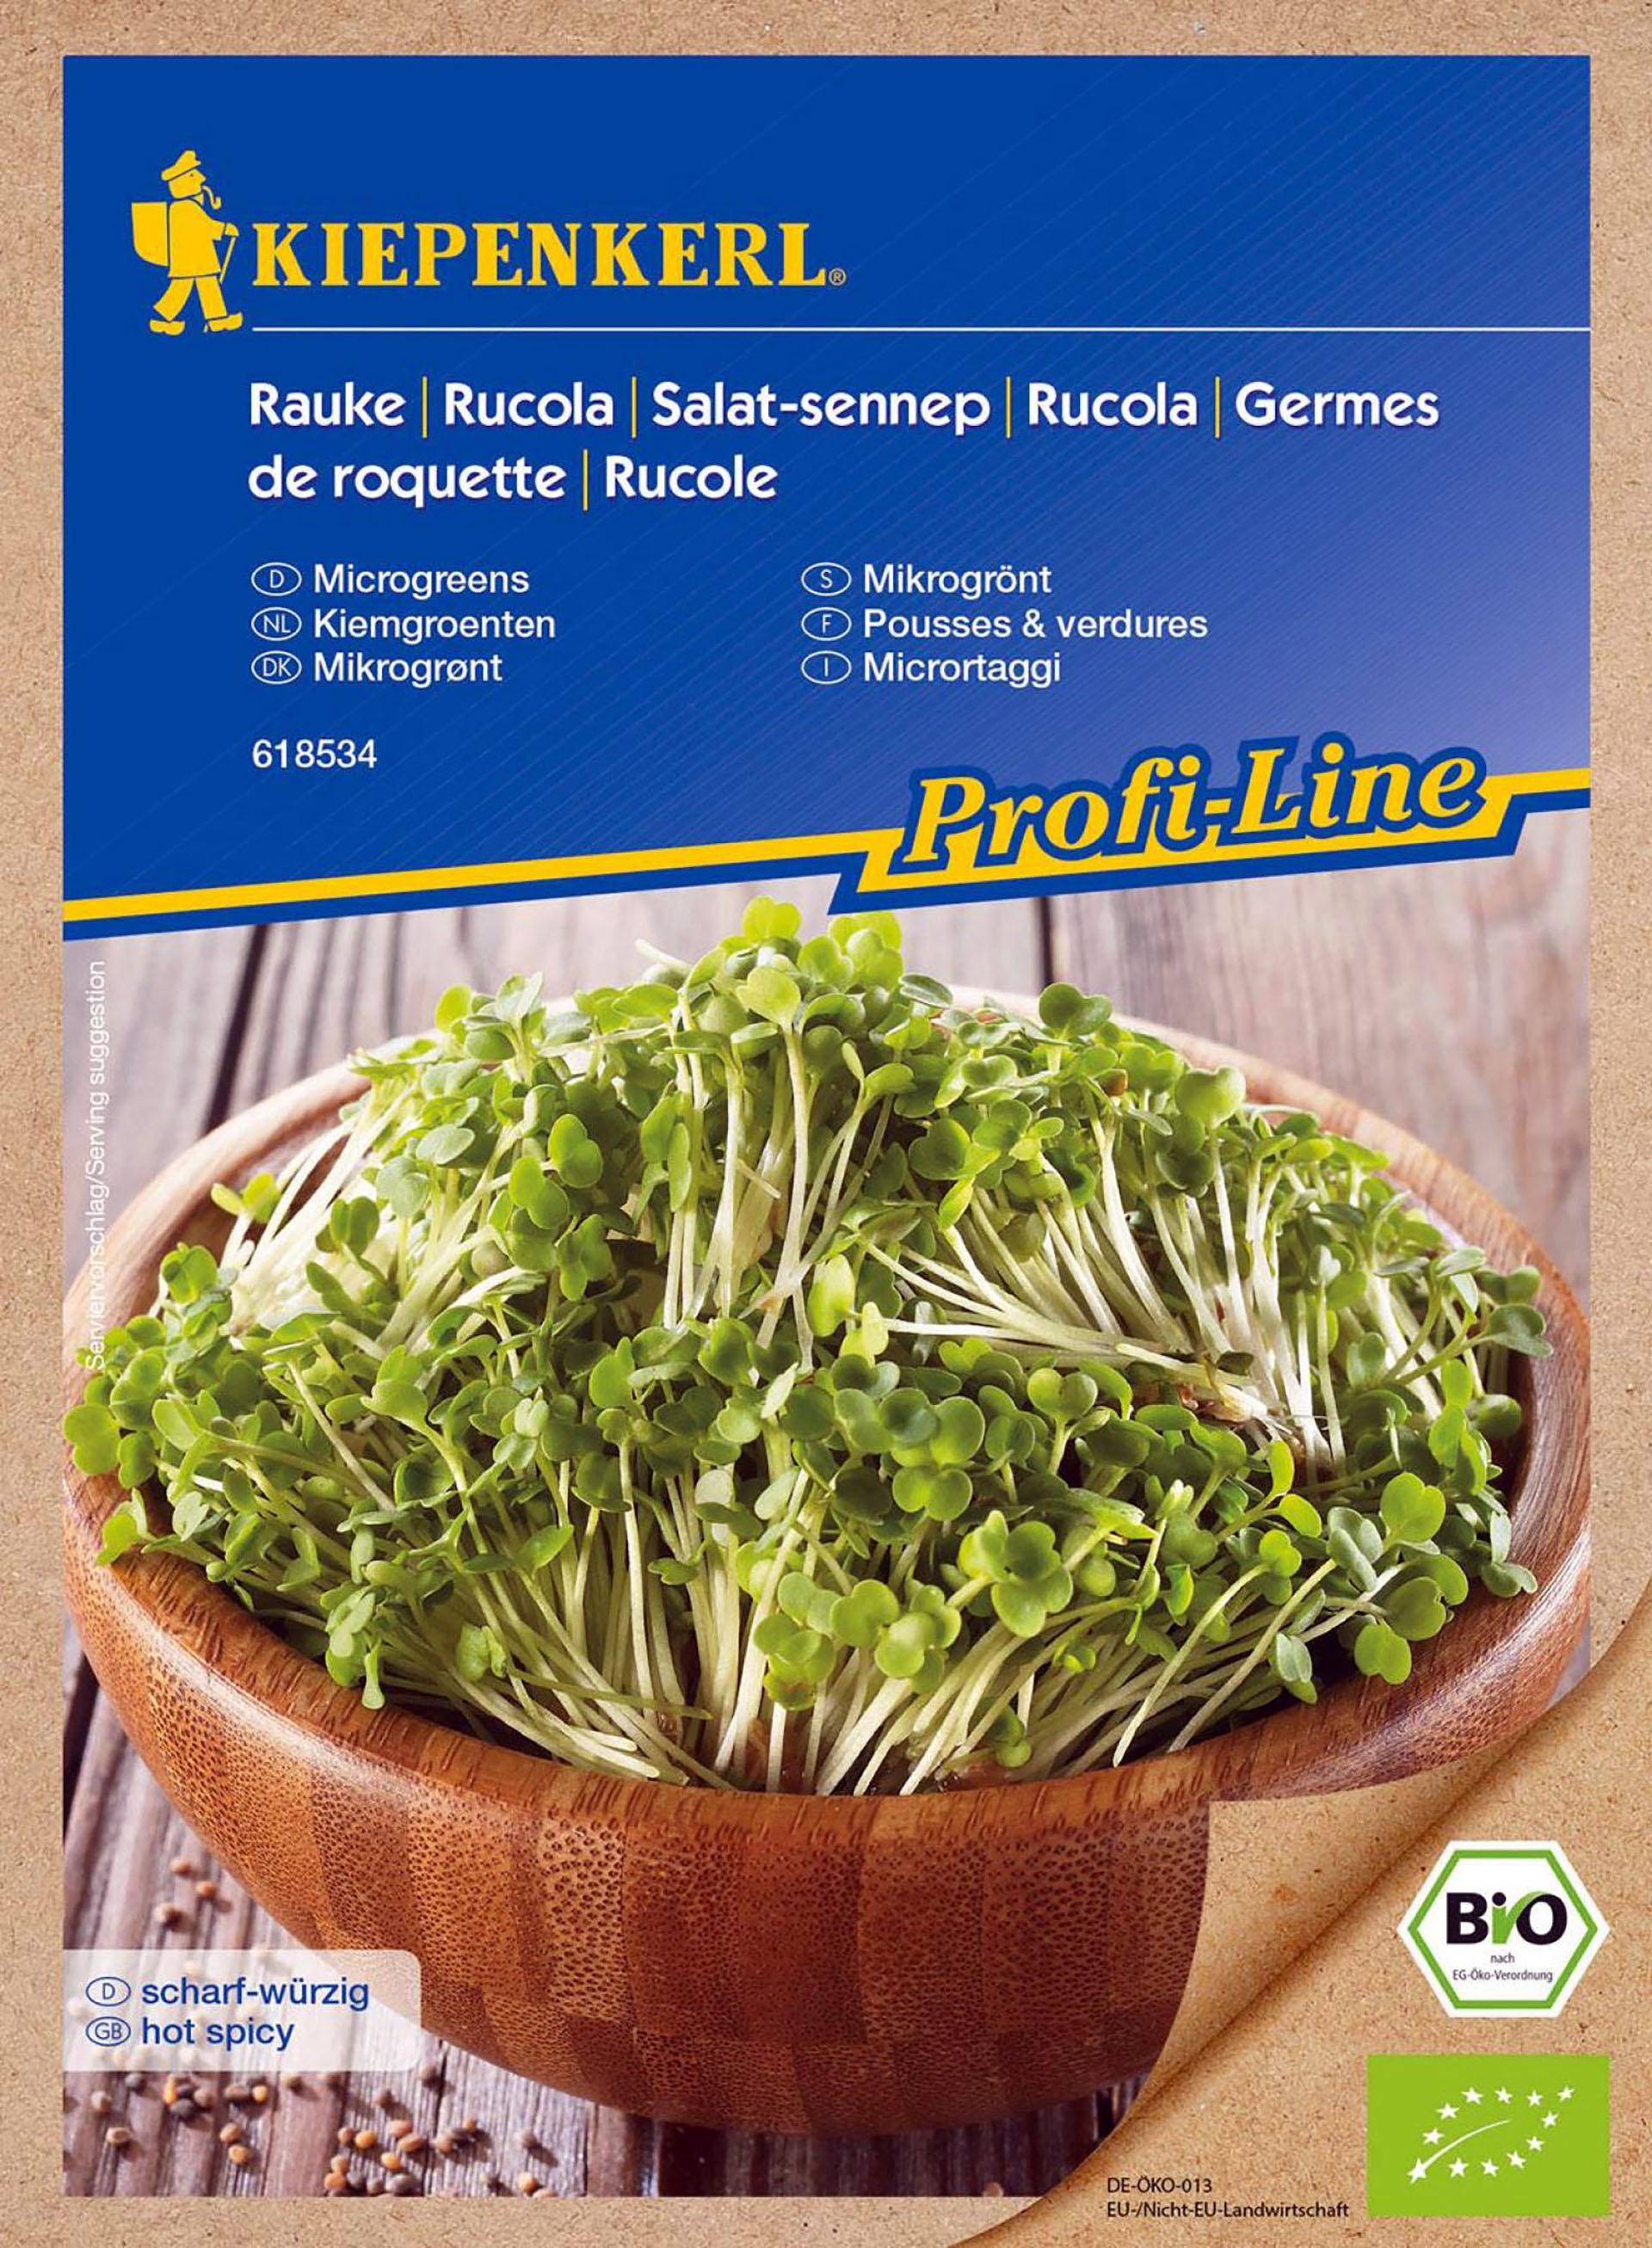 BIO-Keimsprossen Rauke/Rucola PG-N